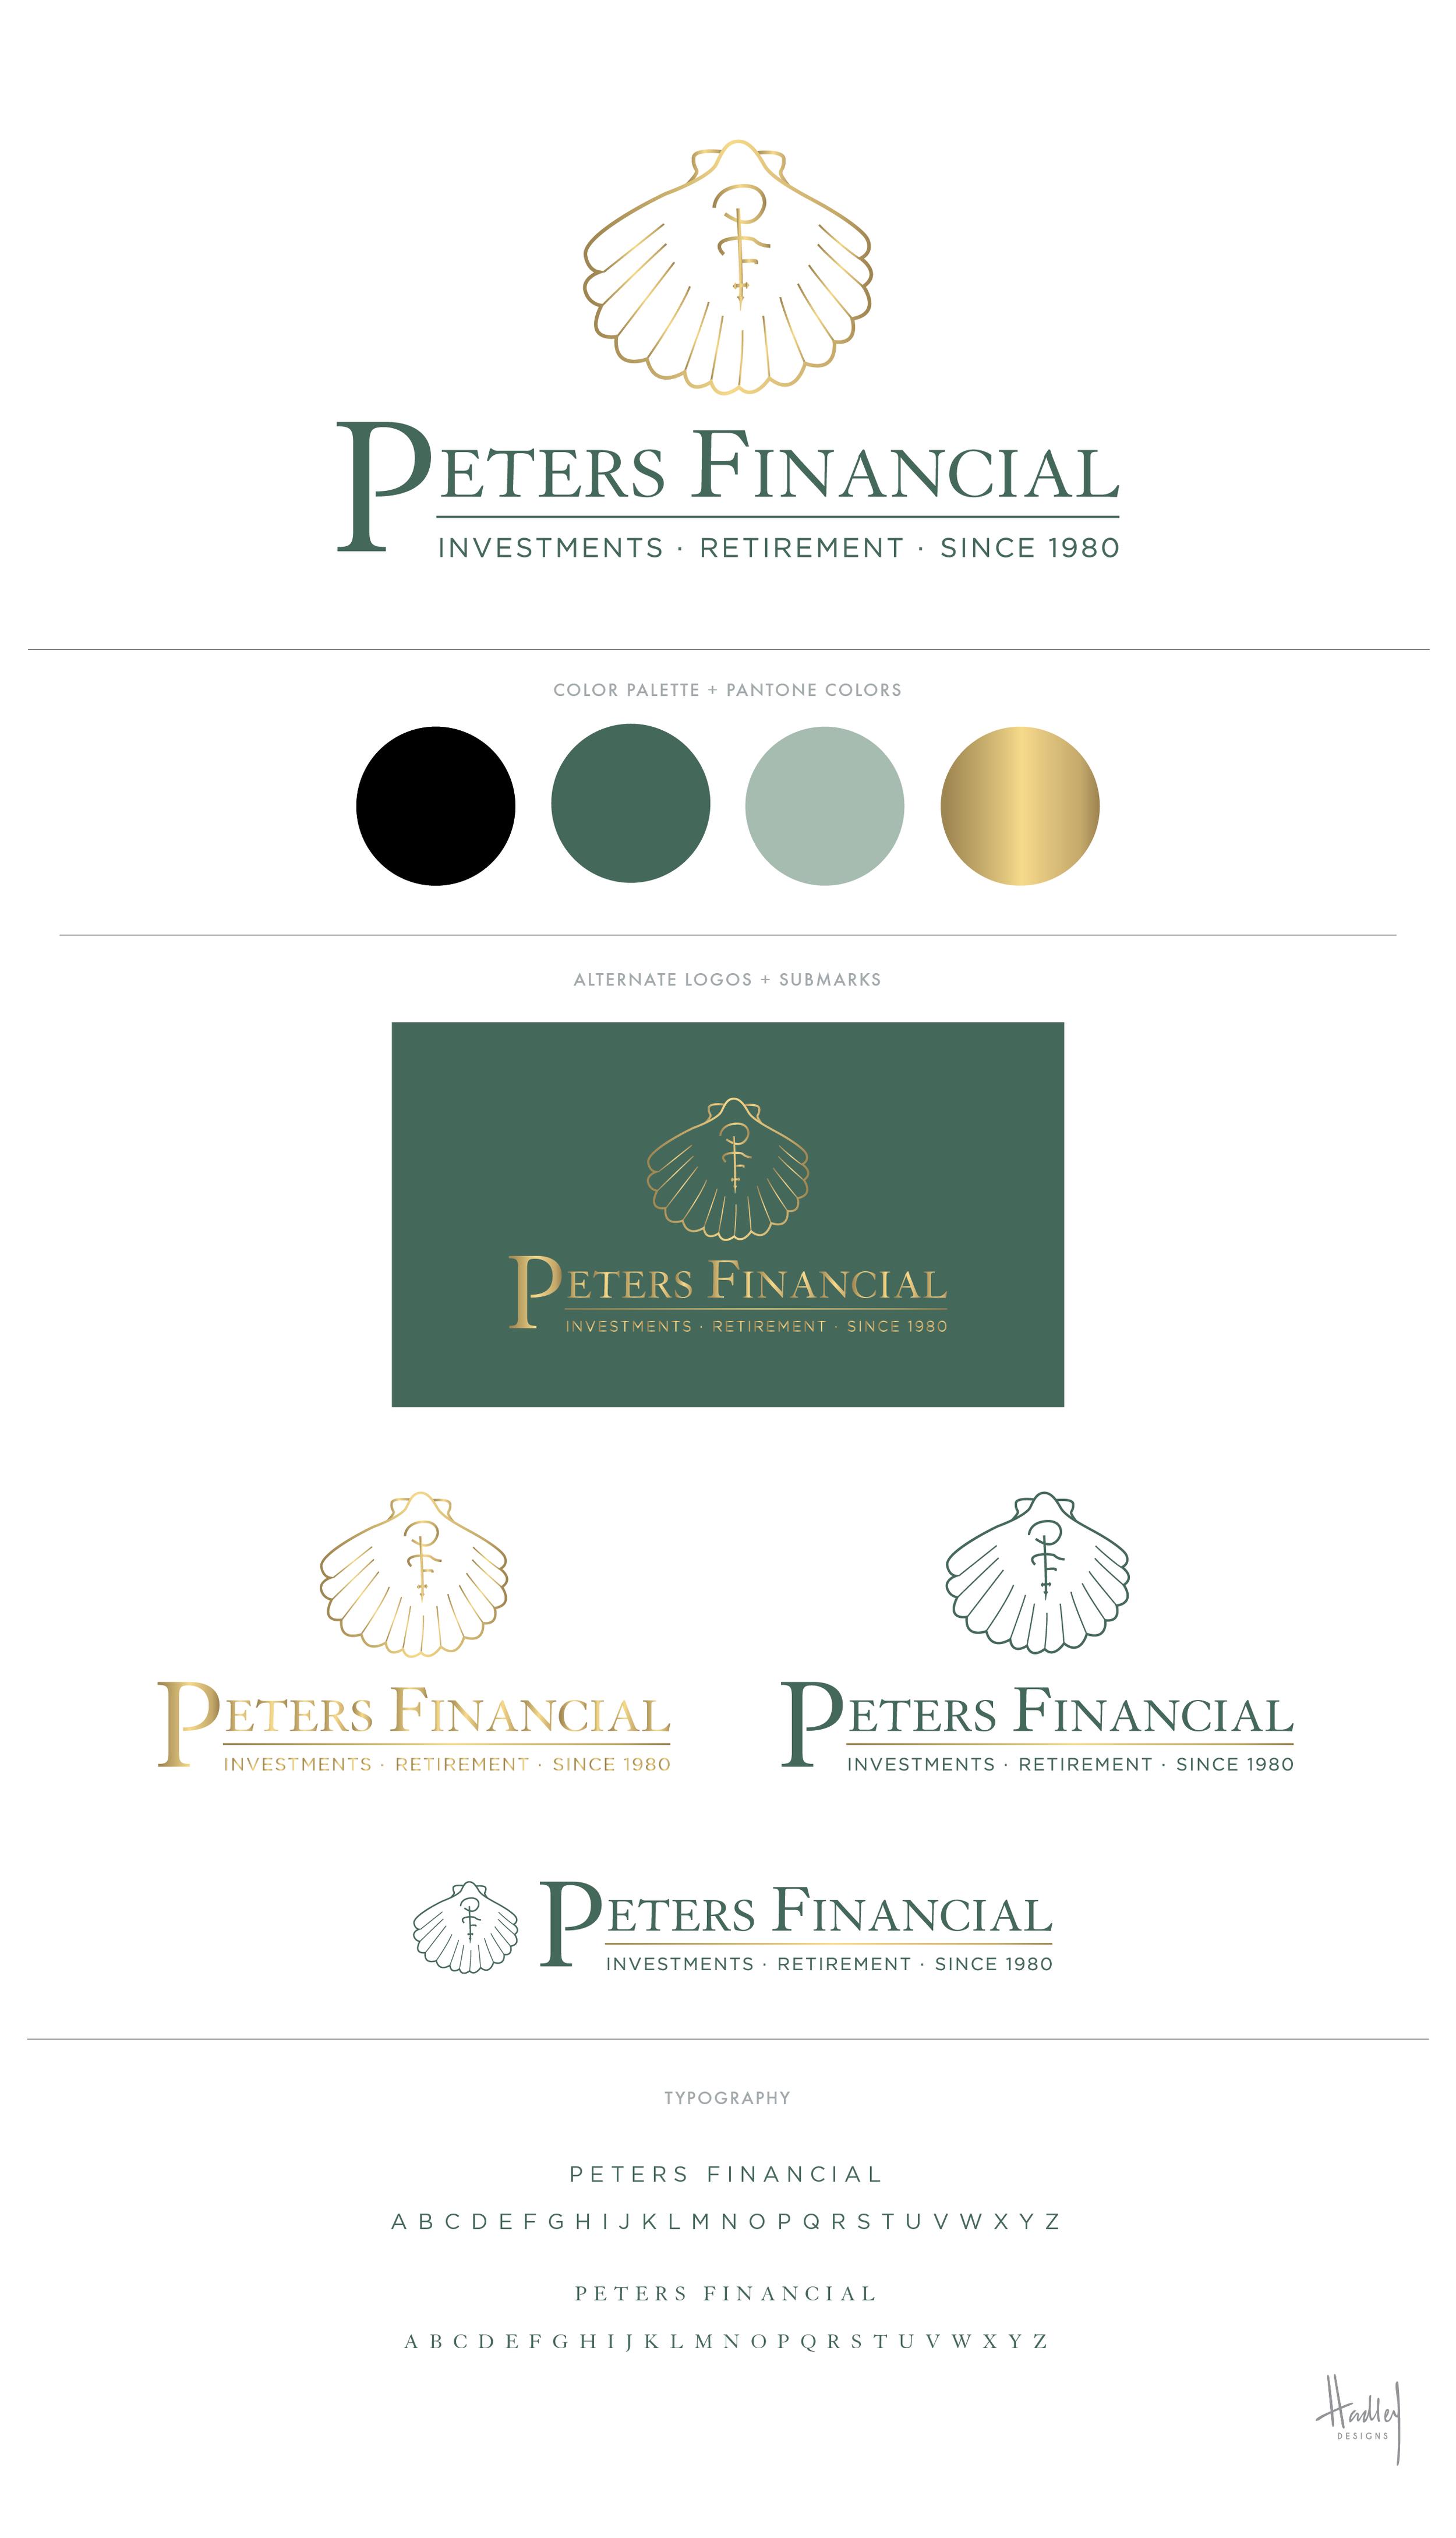 PetersFinancial_Branding_generic.png